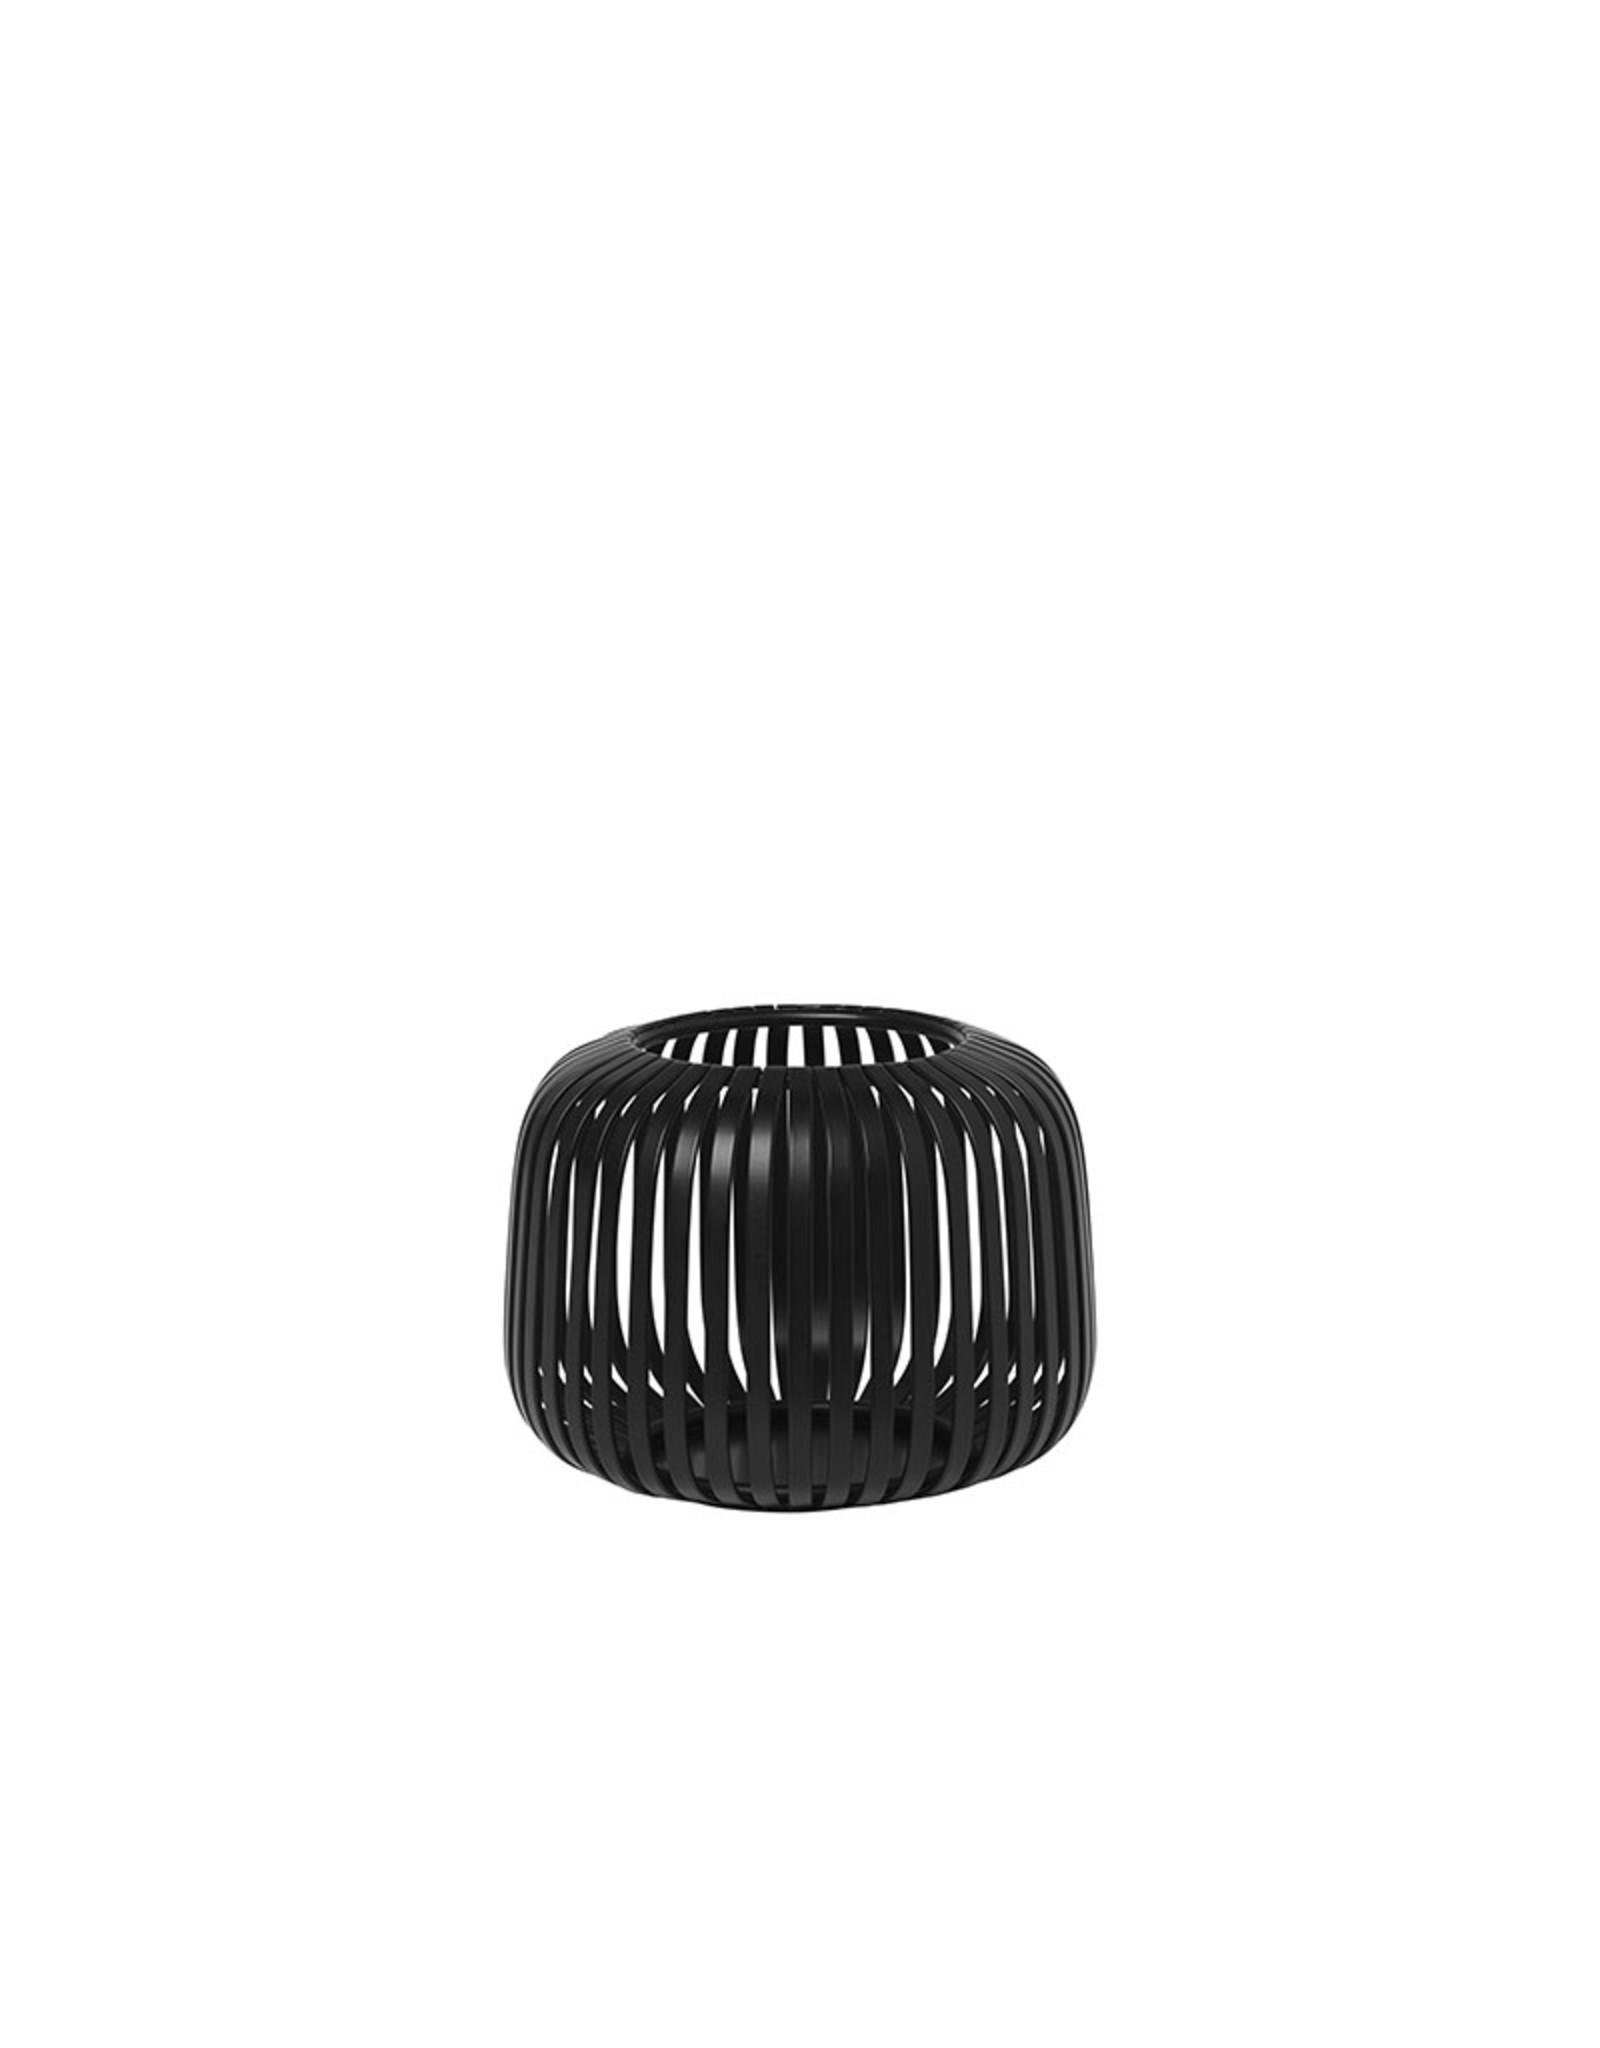 BLOMUS BLOMUS LITO Lantern XS Black